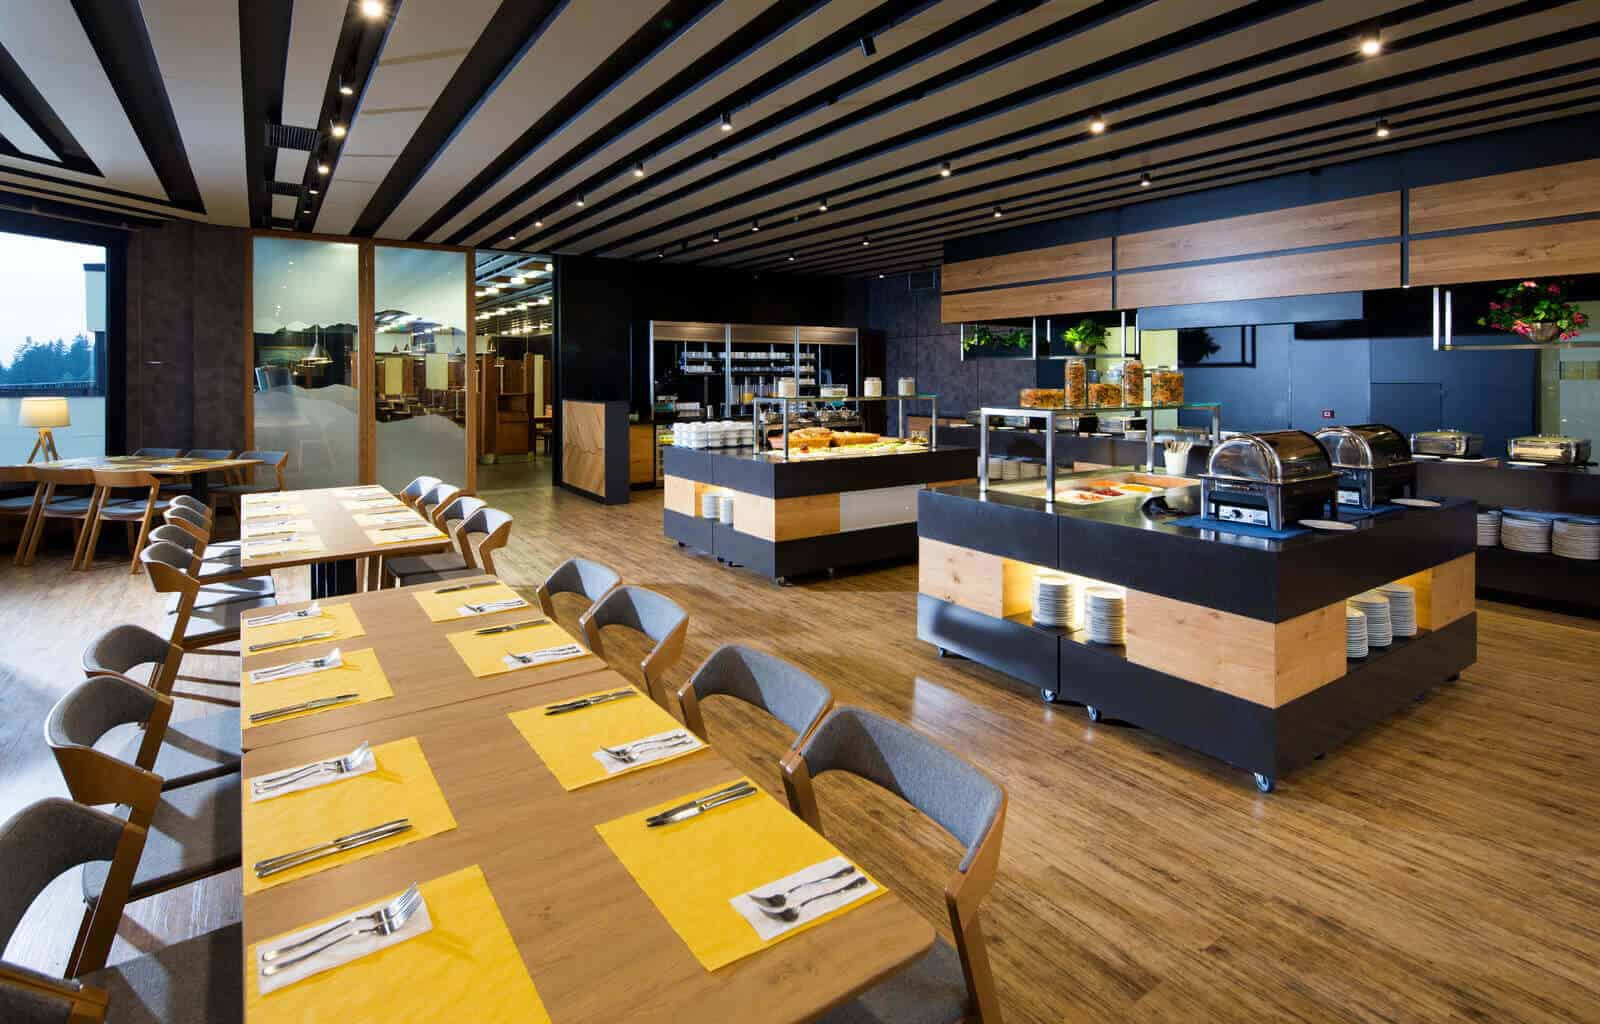 Orea Resort Horal - Ski restaurant